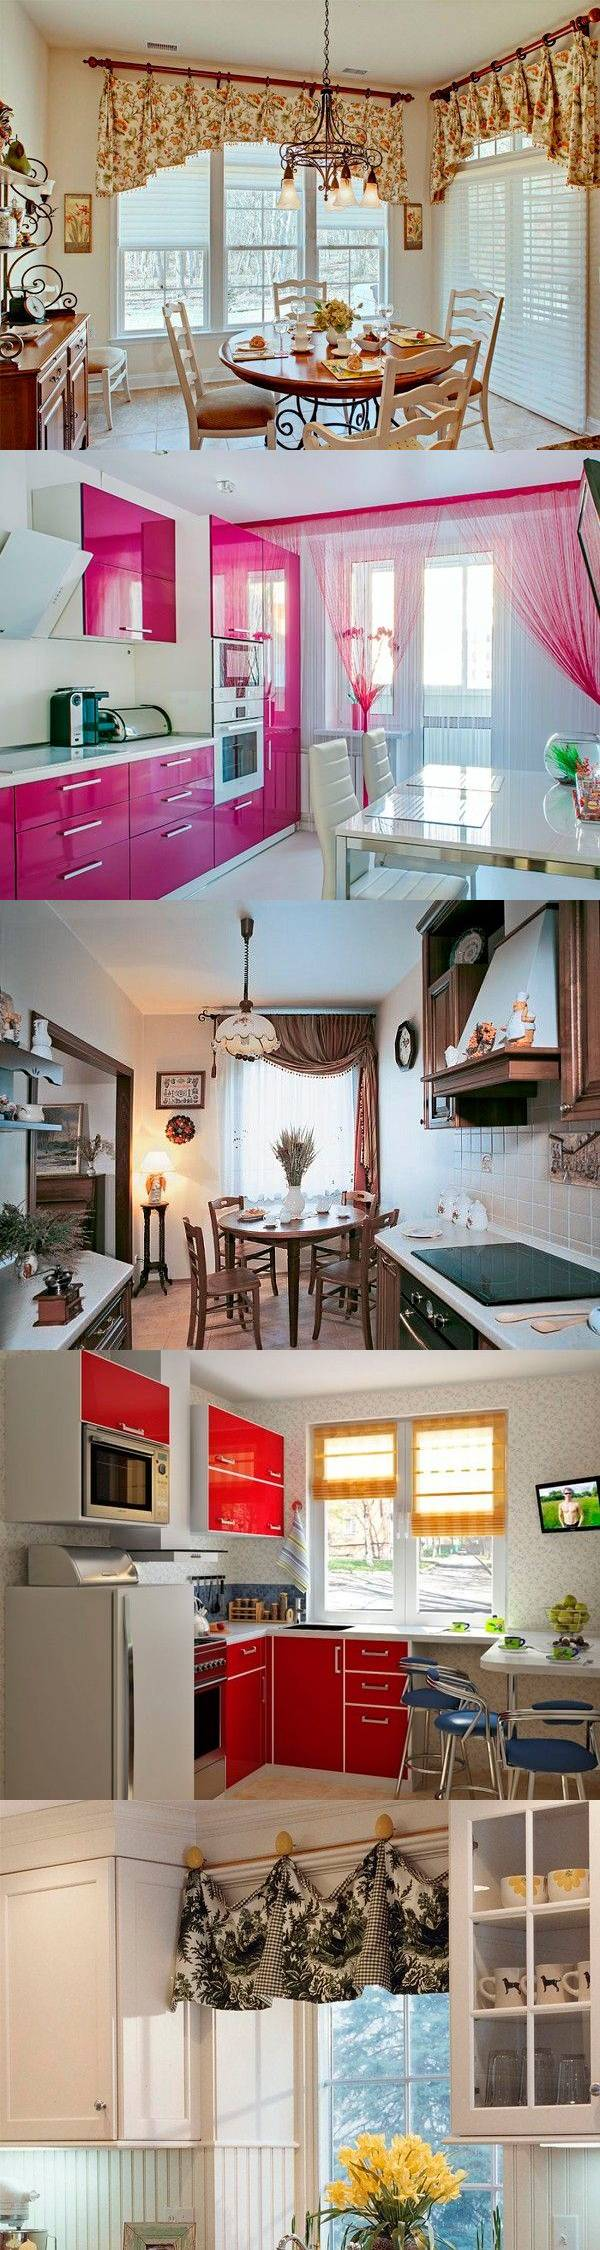 25 идей оформления окна на кухне